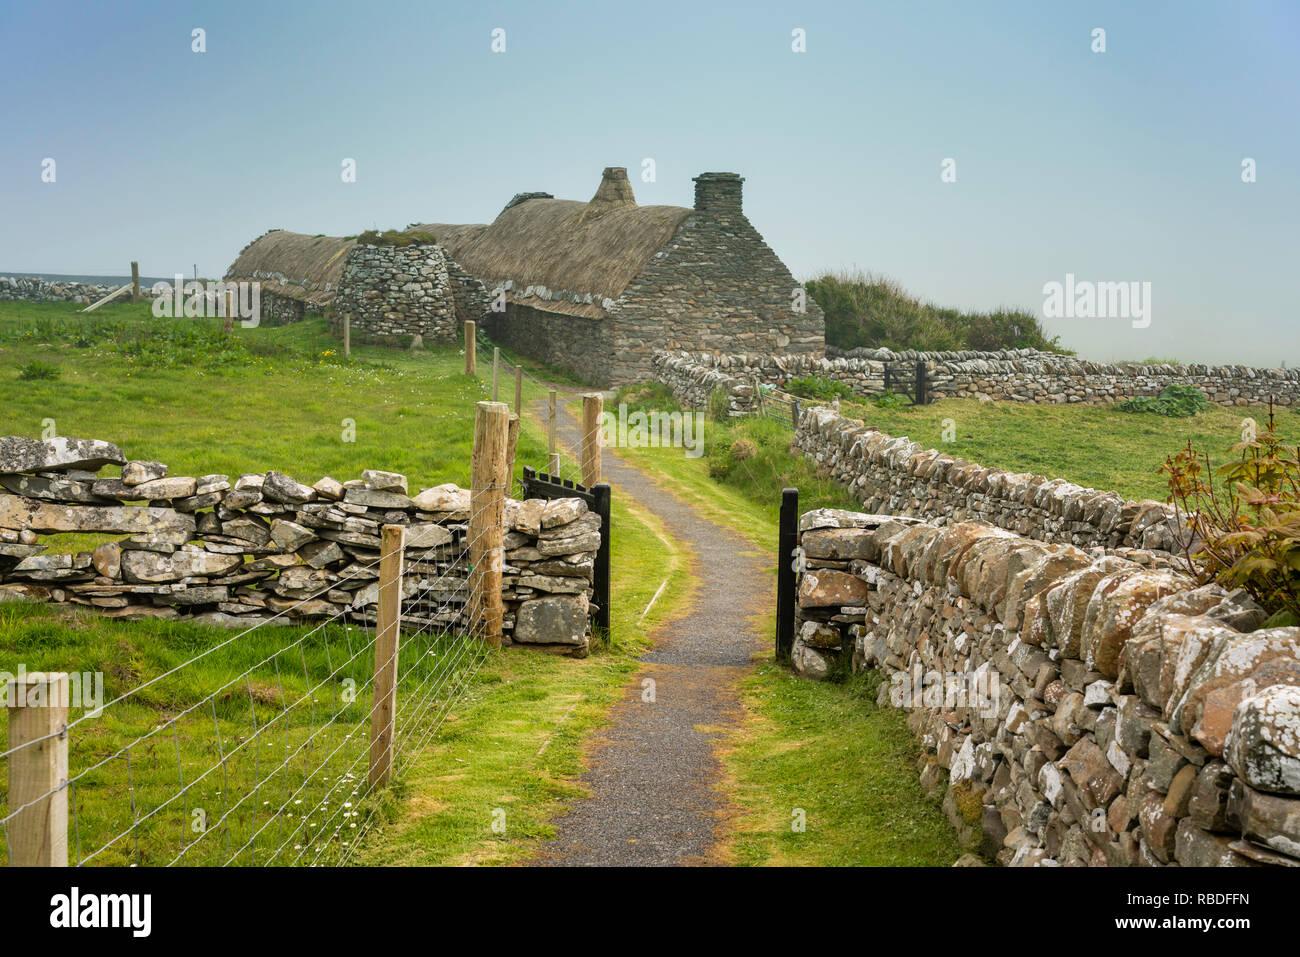 The Croft House Museum in Boddam, Dunrossness, Shetland, Scotland,  United Kingdom, Europe. - Stock Image